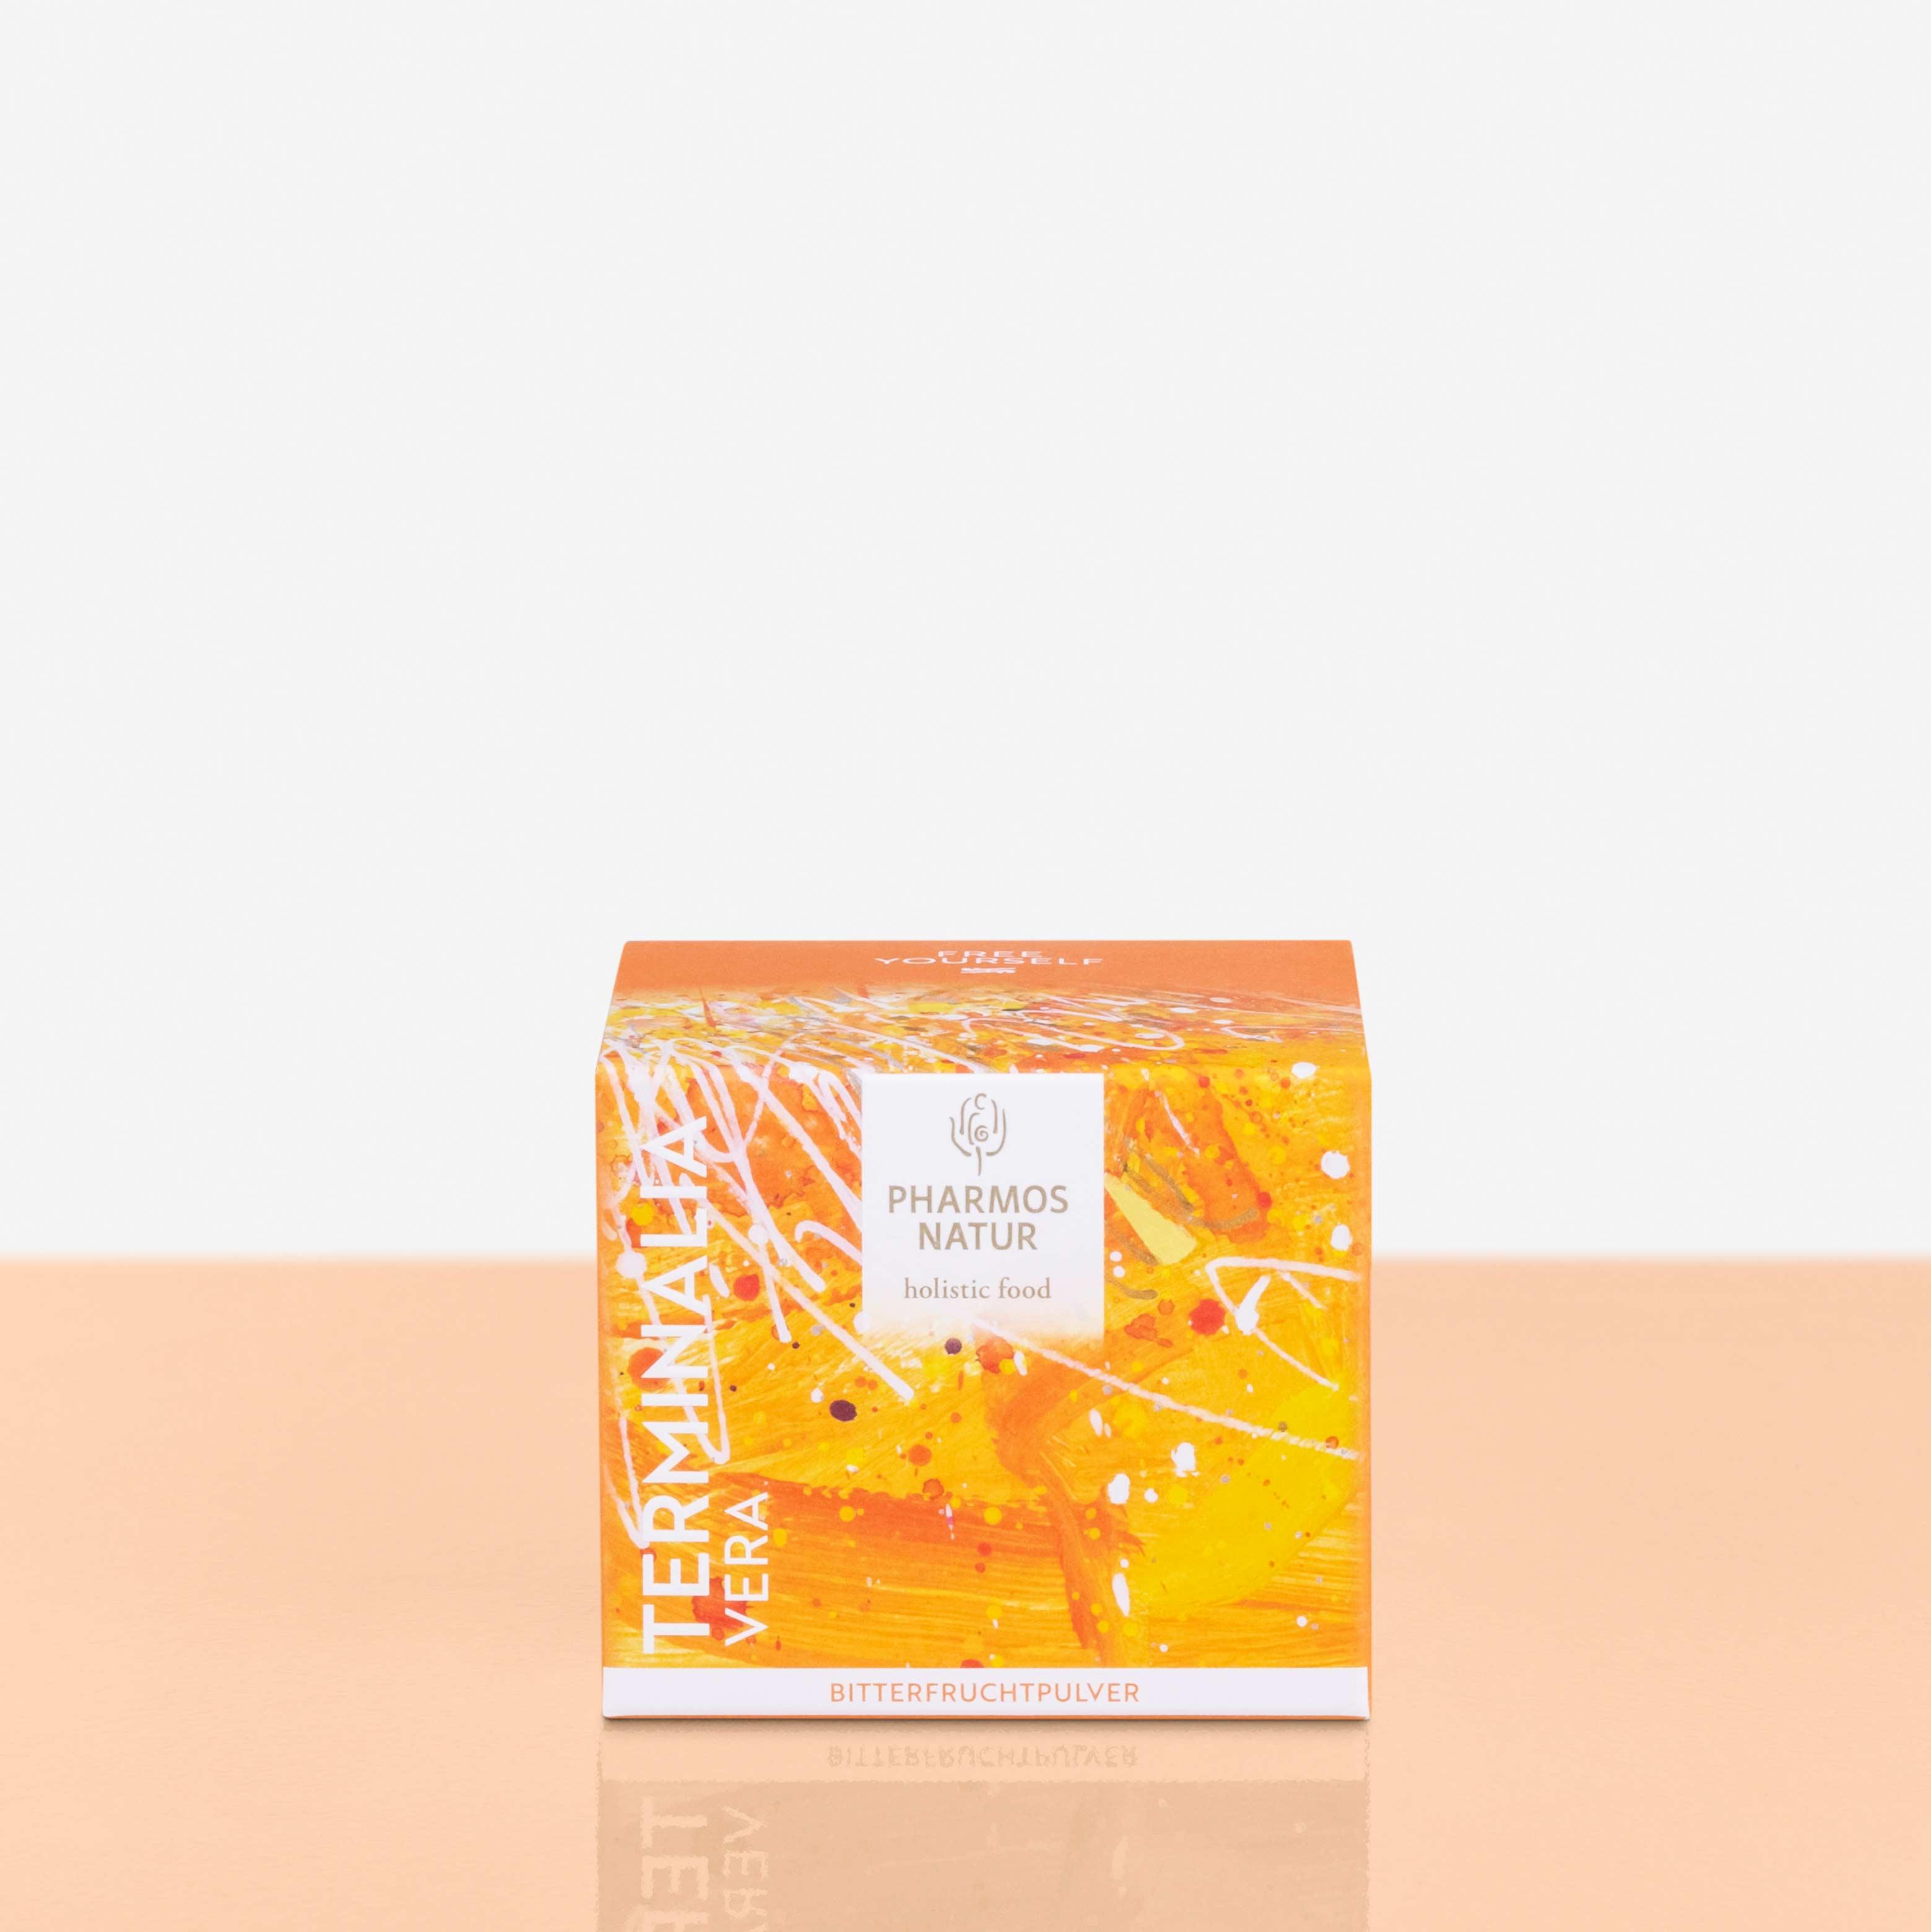 Terminalia Vera gelbe Verpackung Produktbild